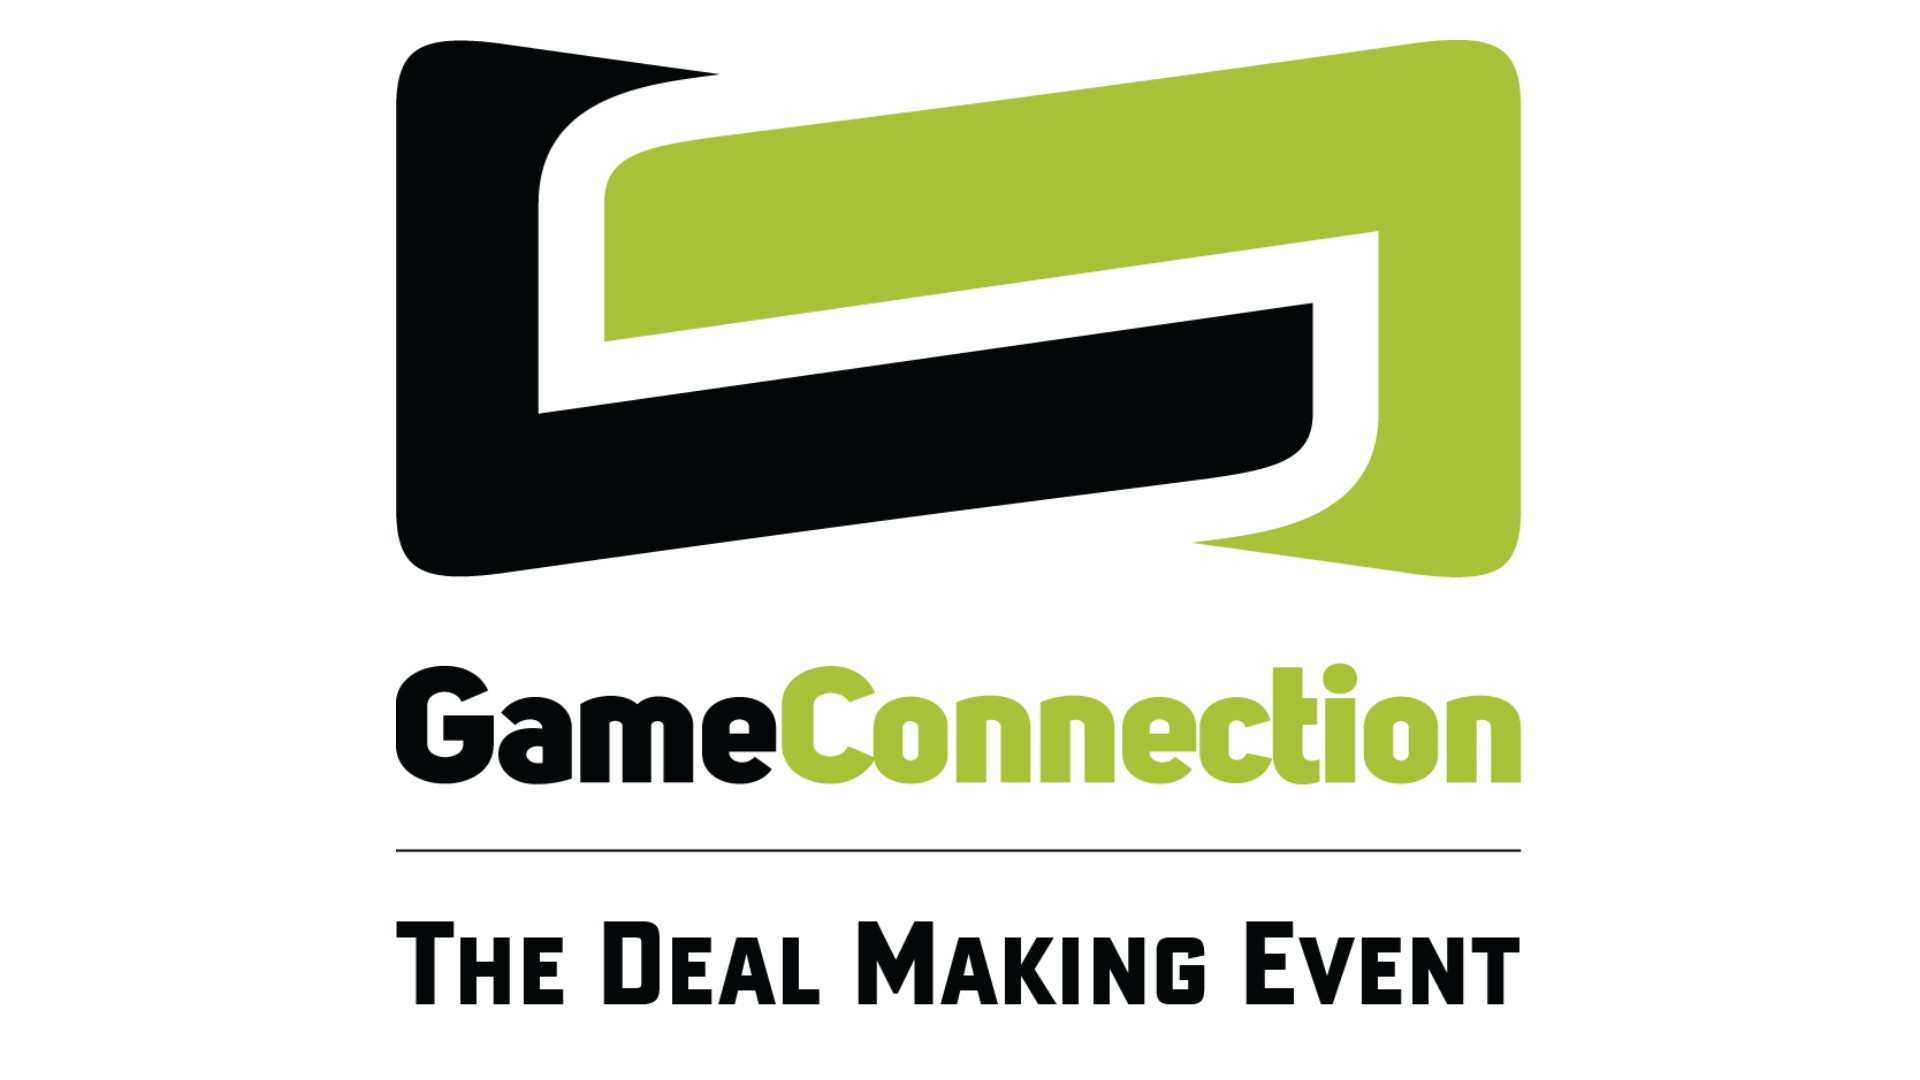 Games Connection (1) Logo